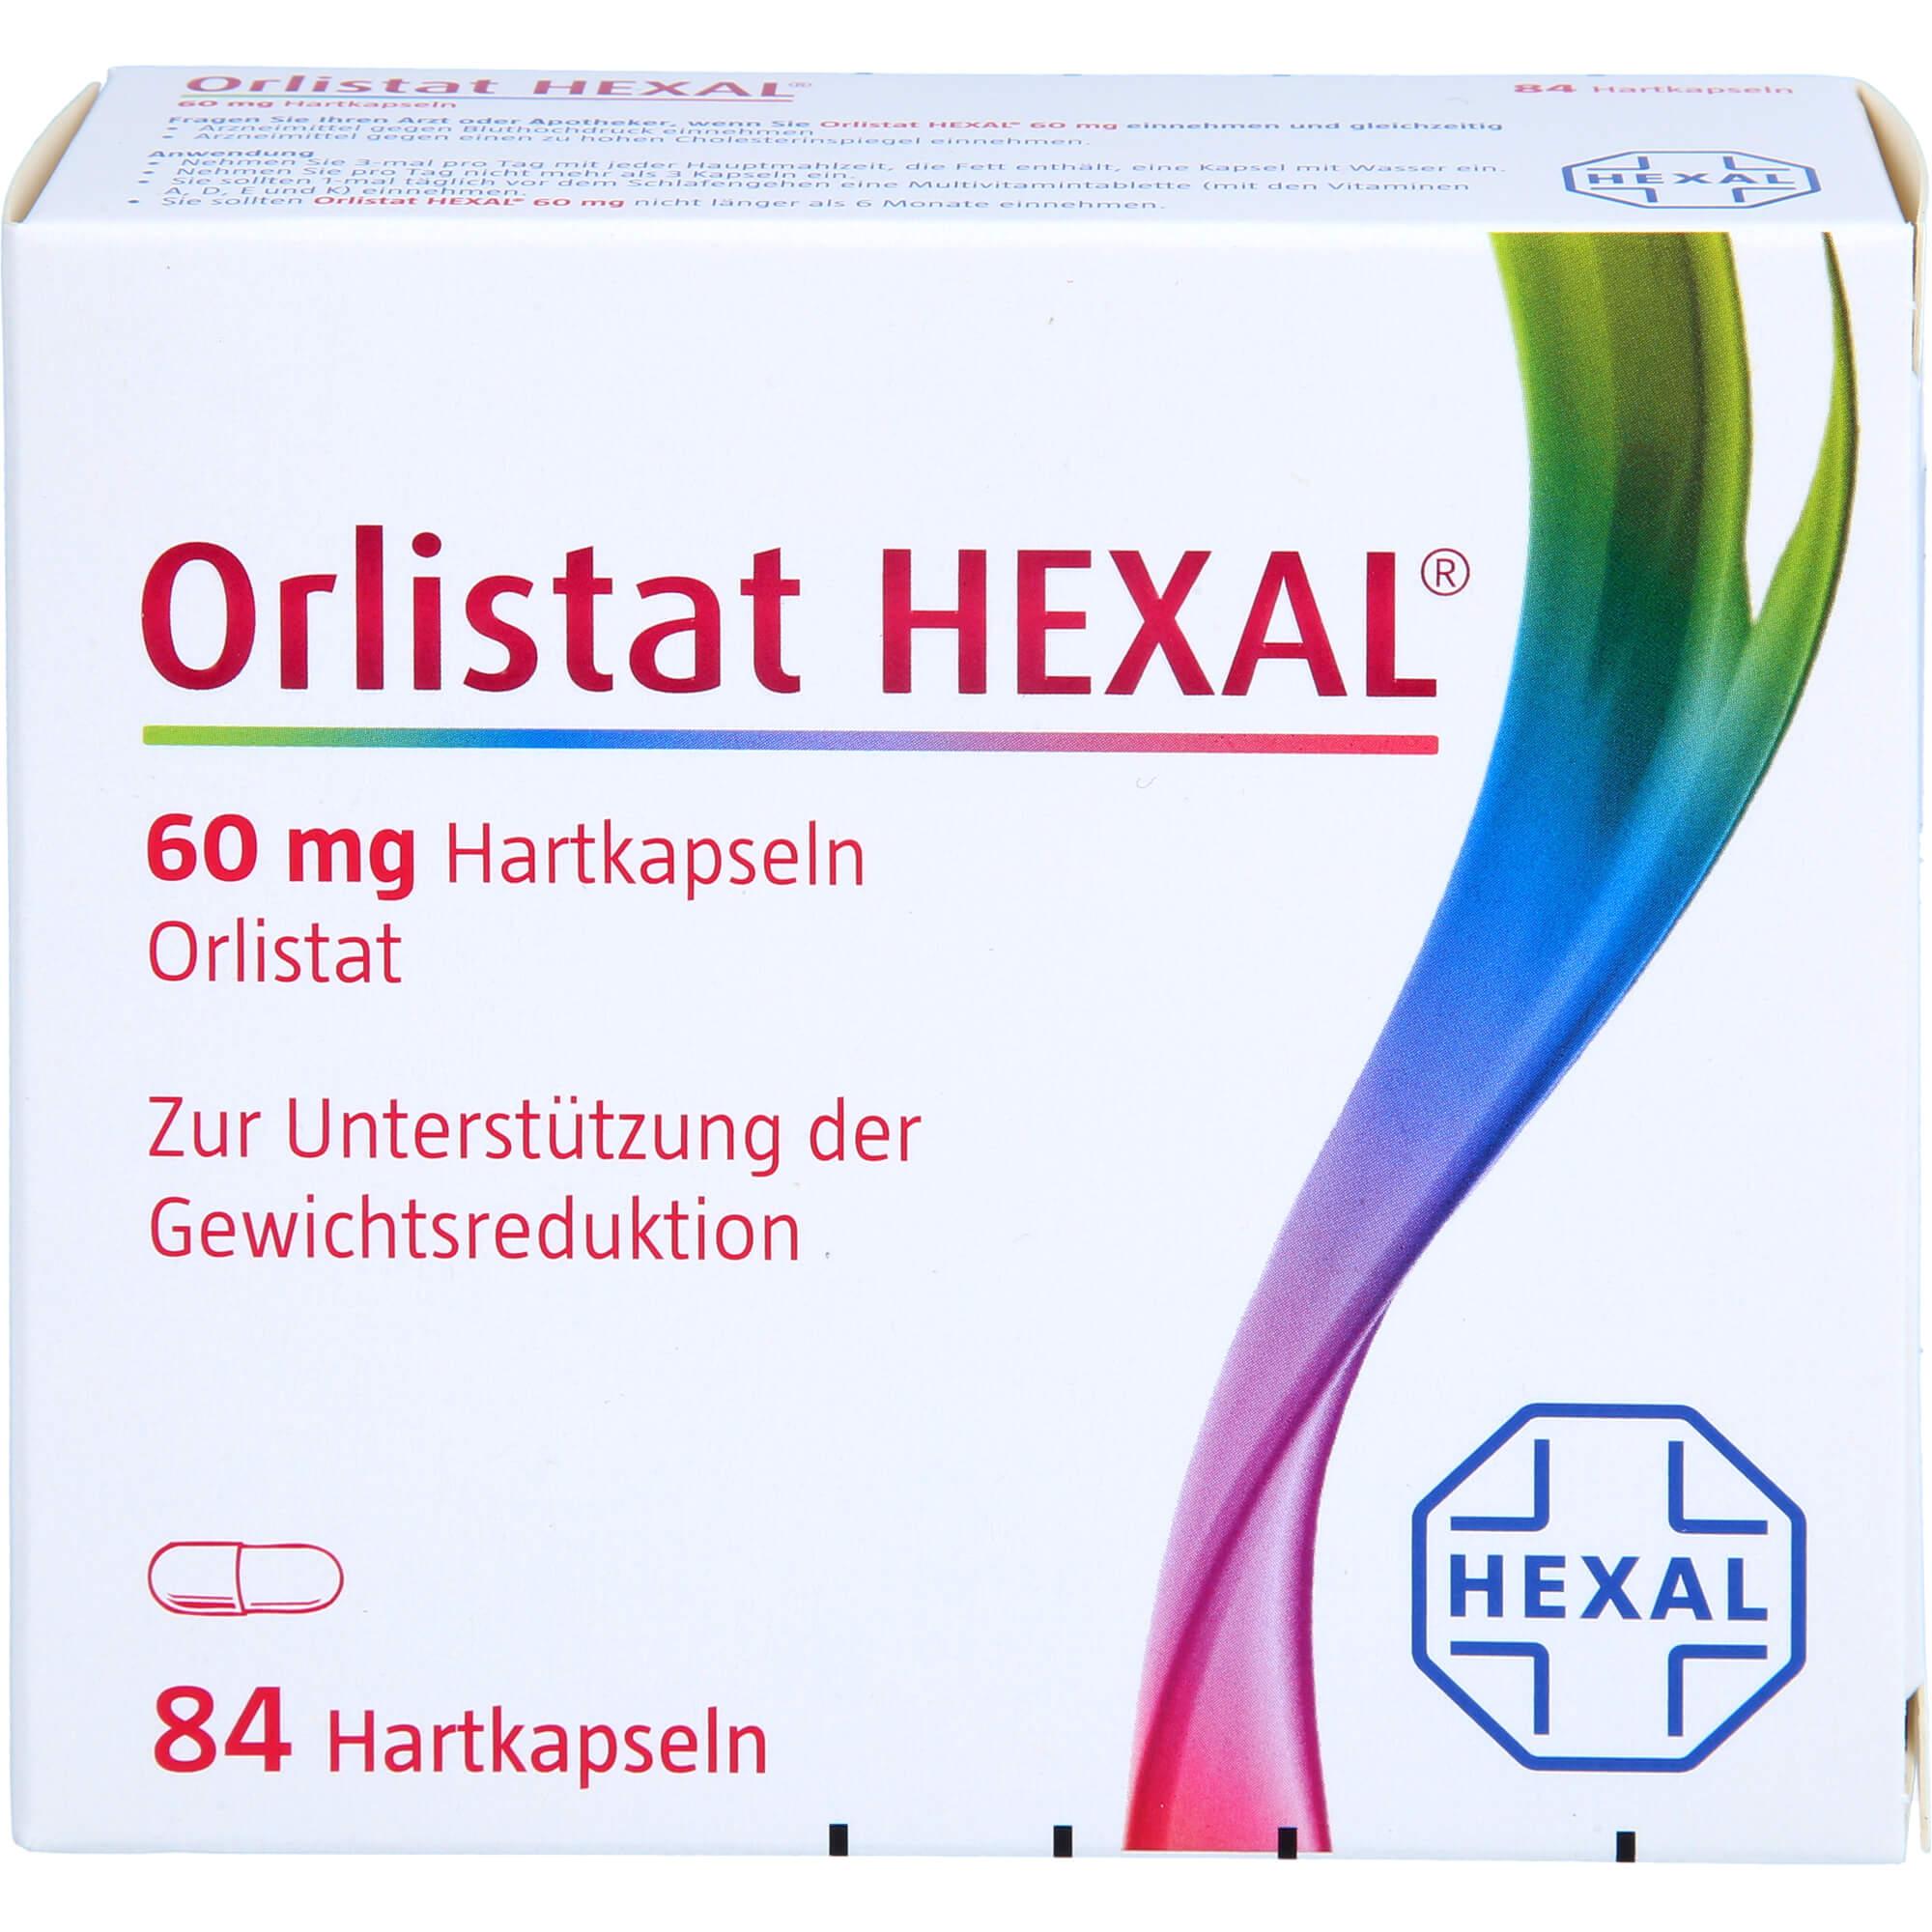 ORLISTAT HEXAL 60 mg Hartkapseln